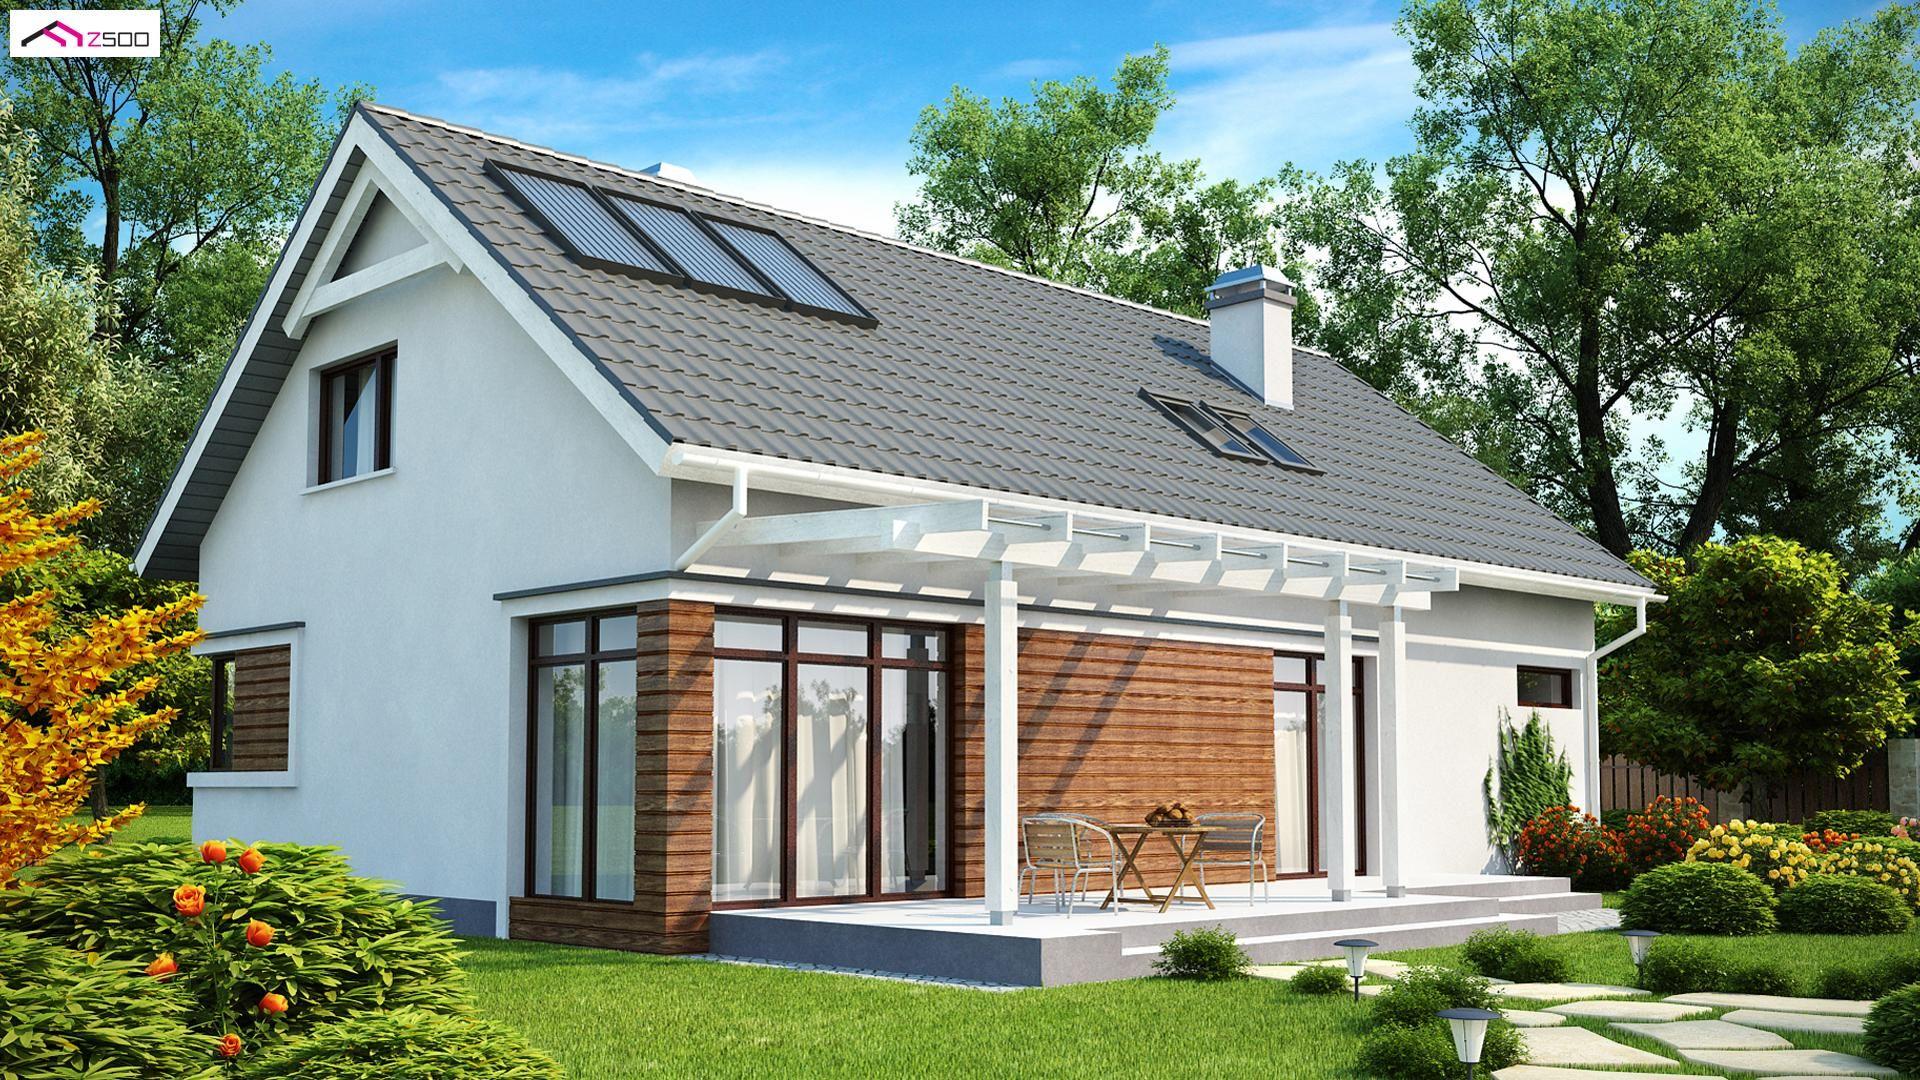 Techwood House Z500 Casas Prefabricadas Aa Properties